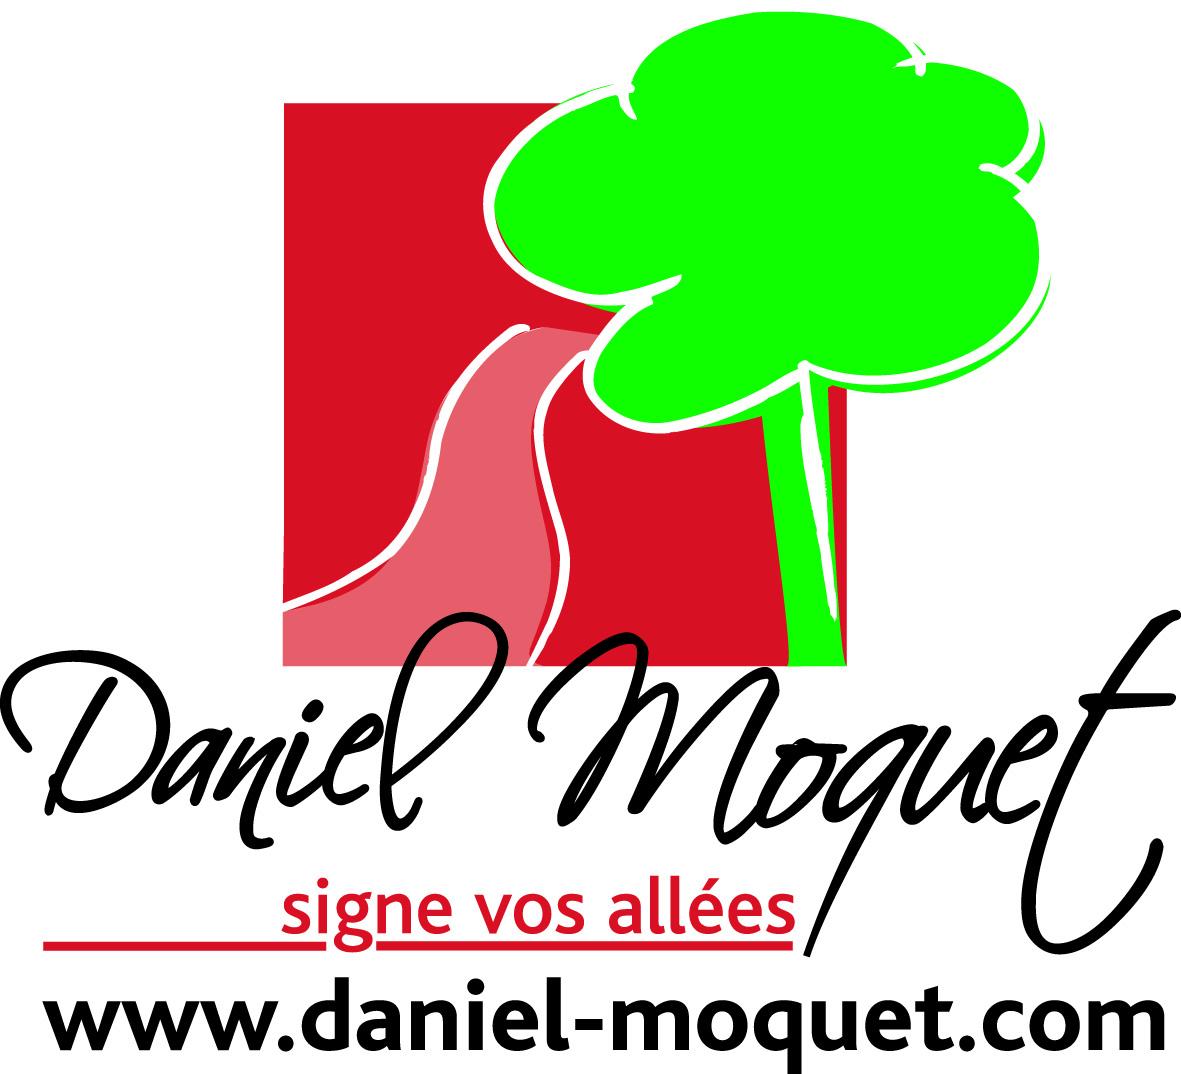 Daniel Moquet signe vos allées - Ent. Cardenas